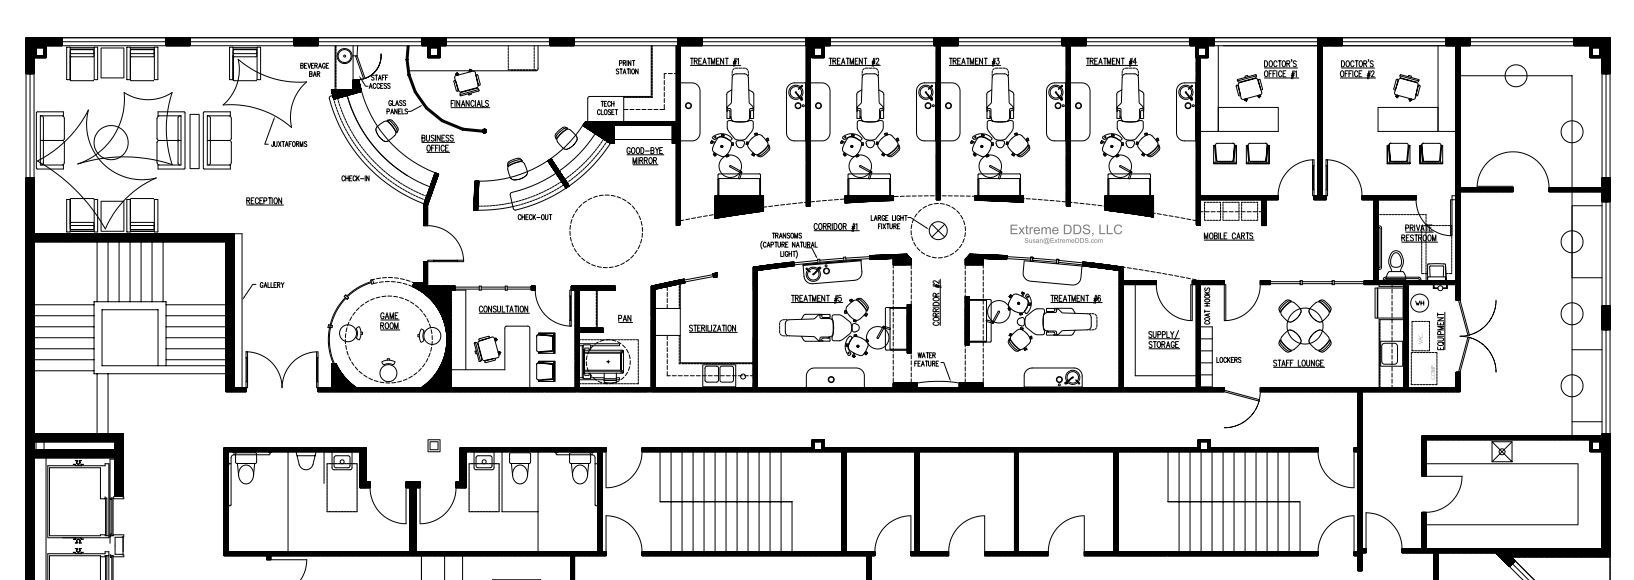 3,152 sq.ft.